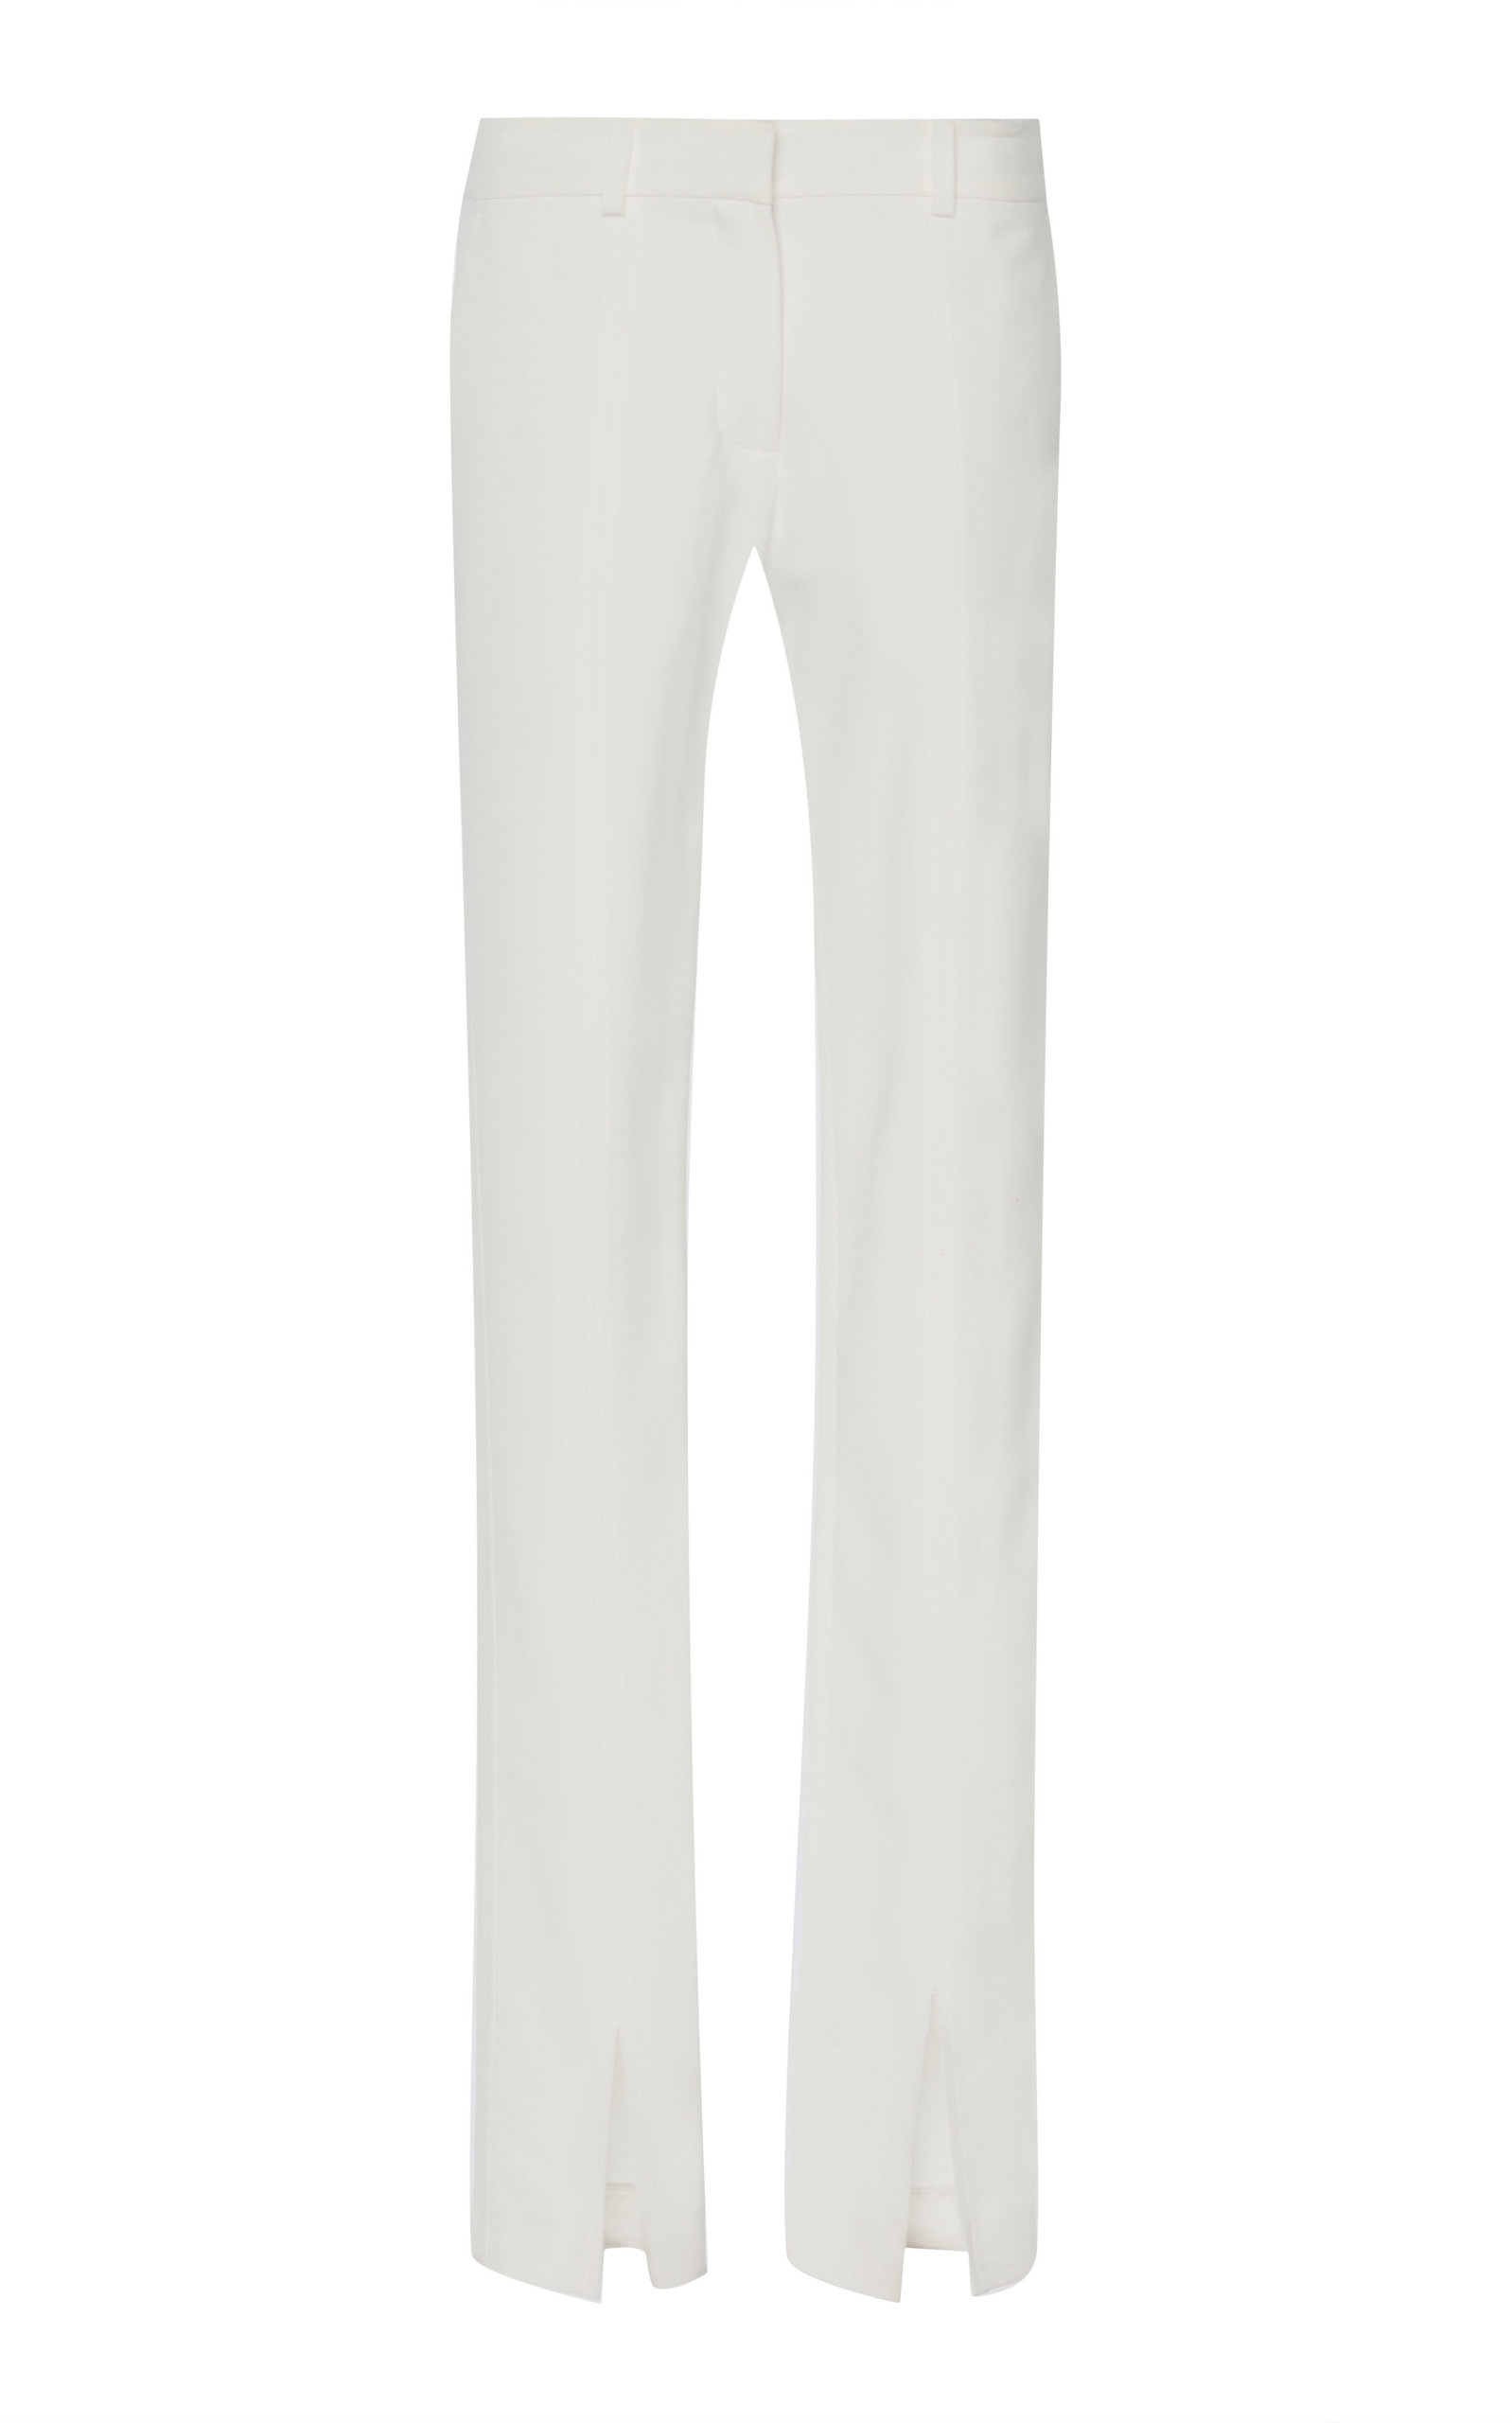 Victoria Beckham SKINNY SLIT-HEM PANTS